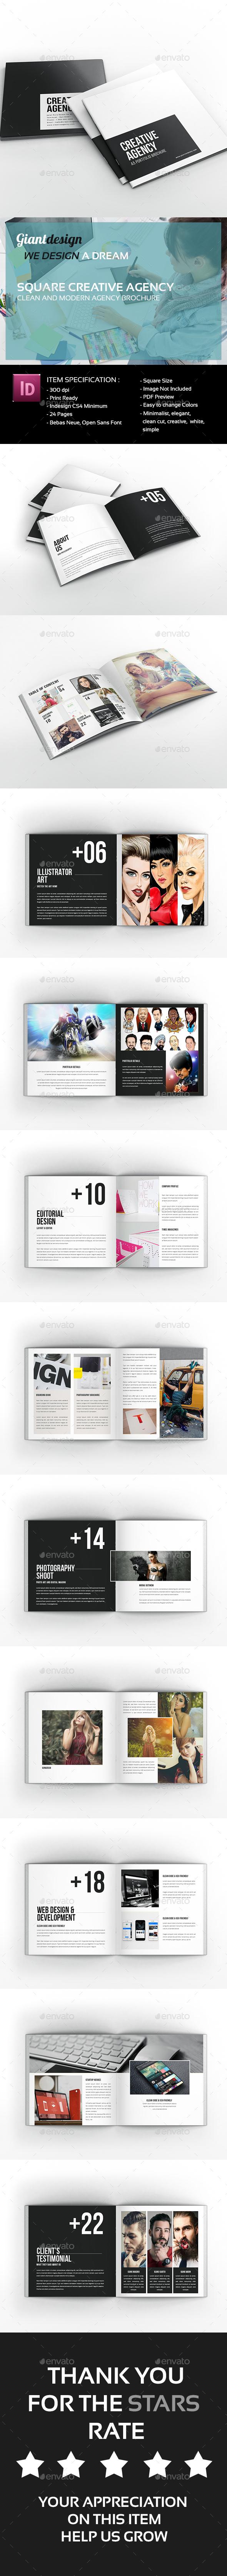 Creative Agency - Square Portfolio Brochure - Portfolio Brochures